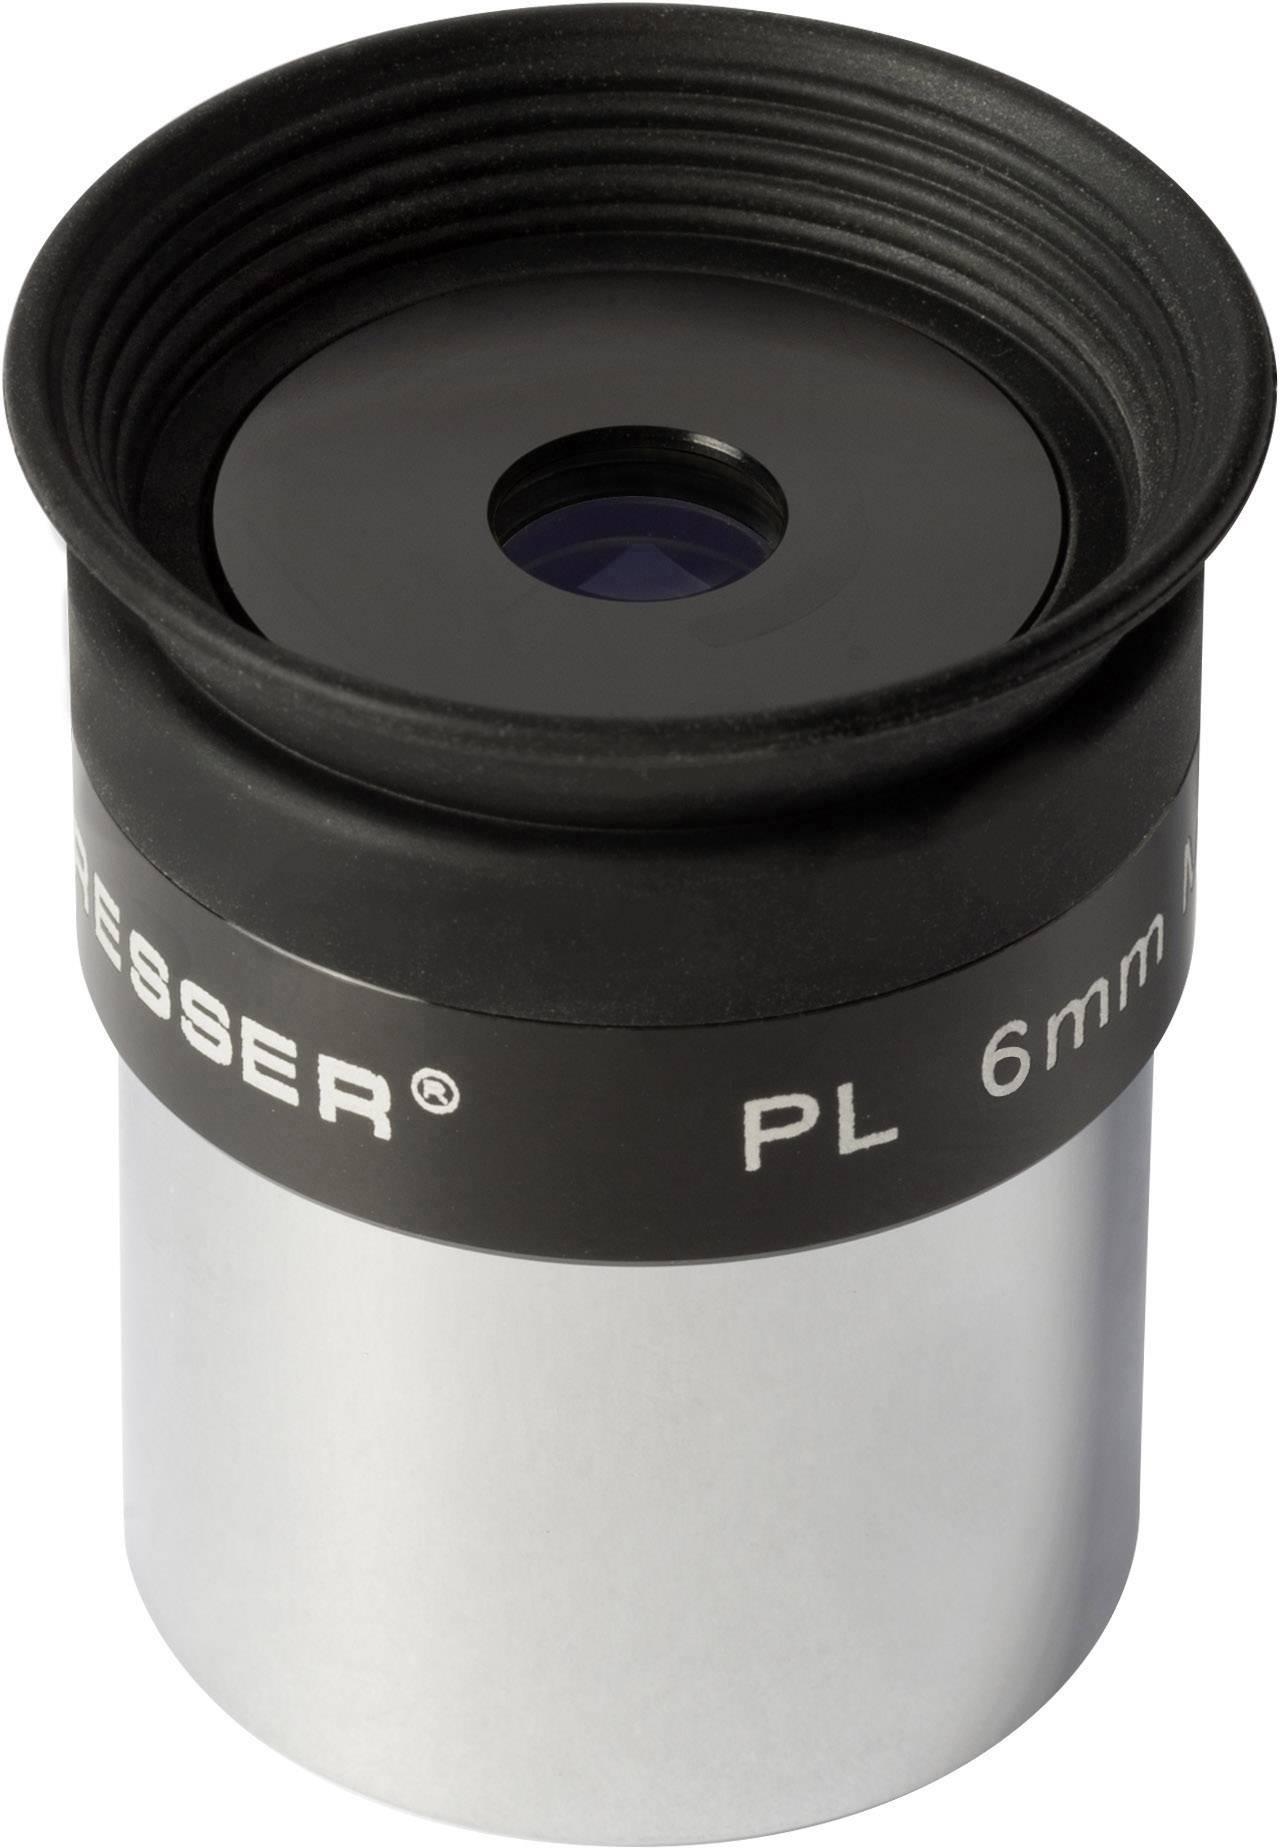 Okular Bresser Optik PL 6.5mm 4920206